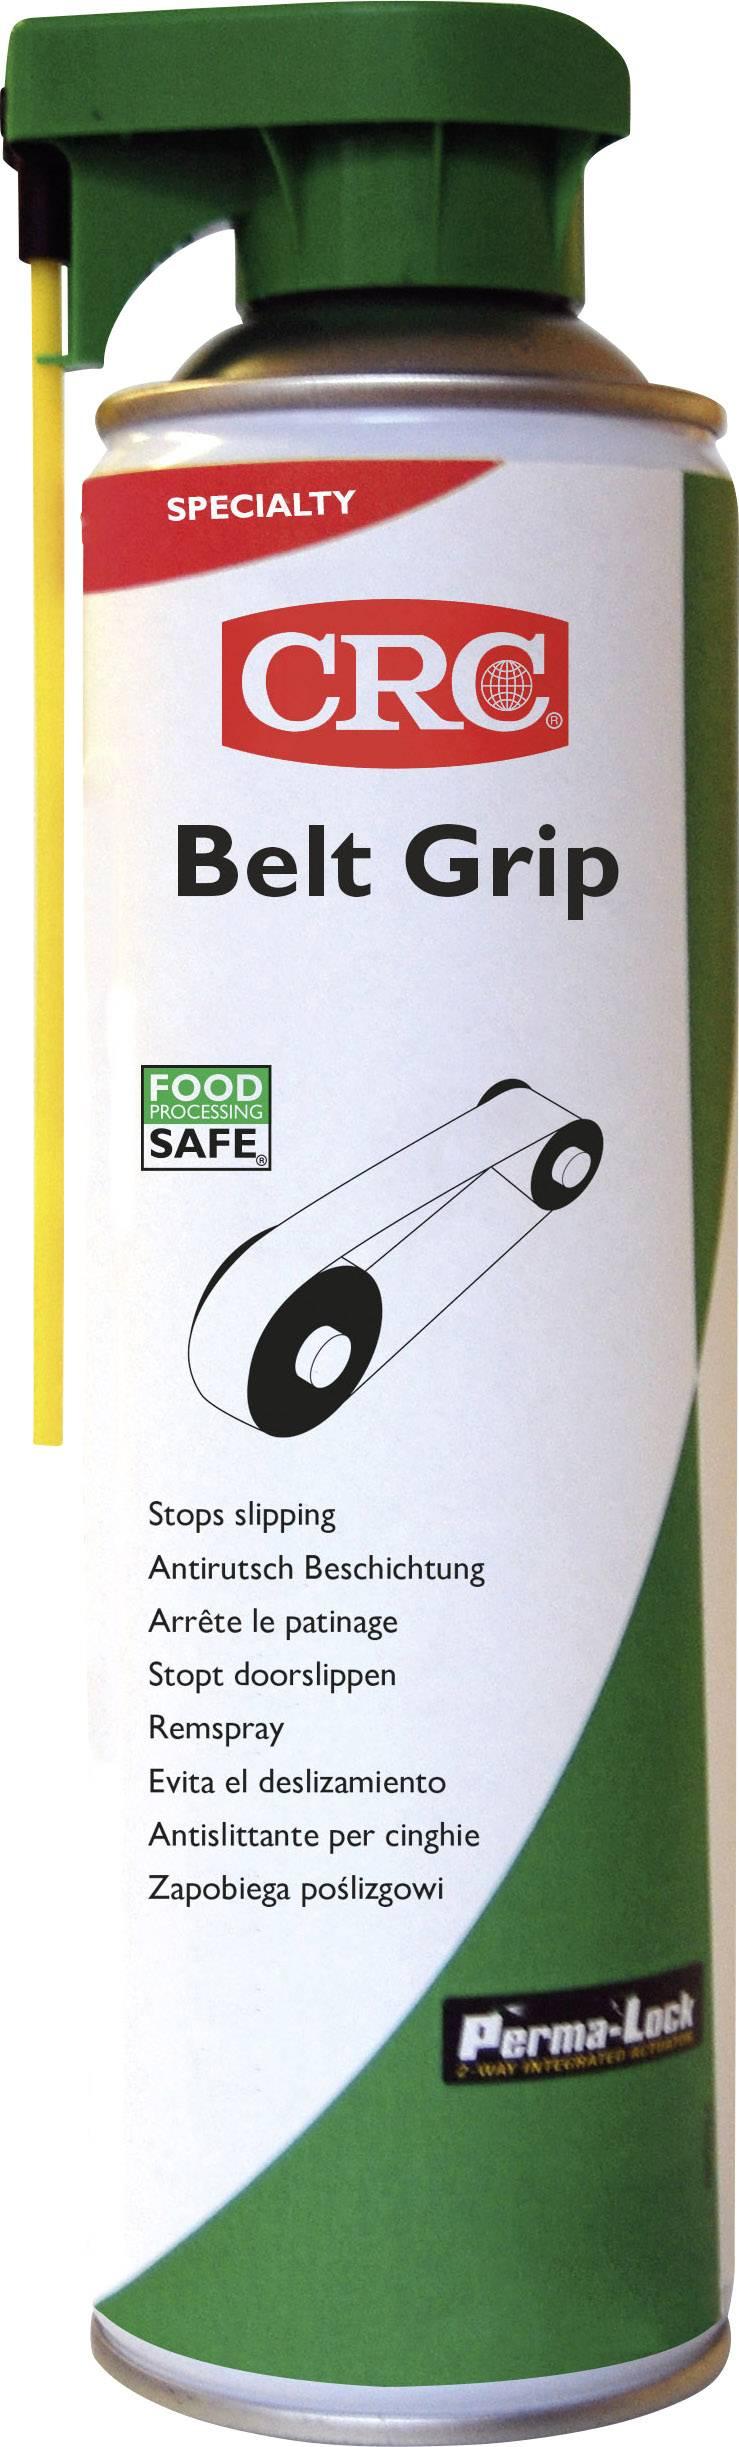 Sprej na klínový řemen CRC BELT GRIP 32601-AA, 500 ml